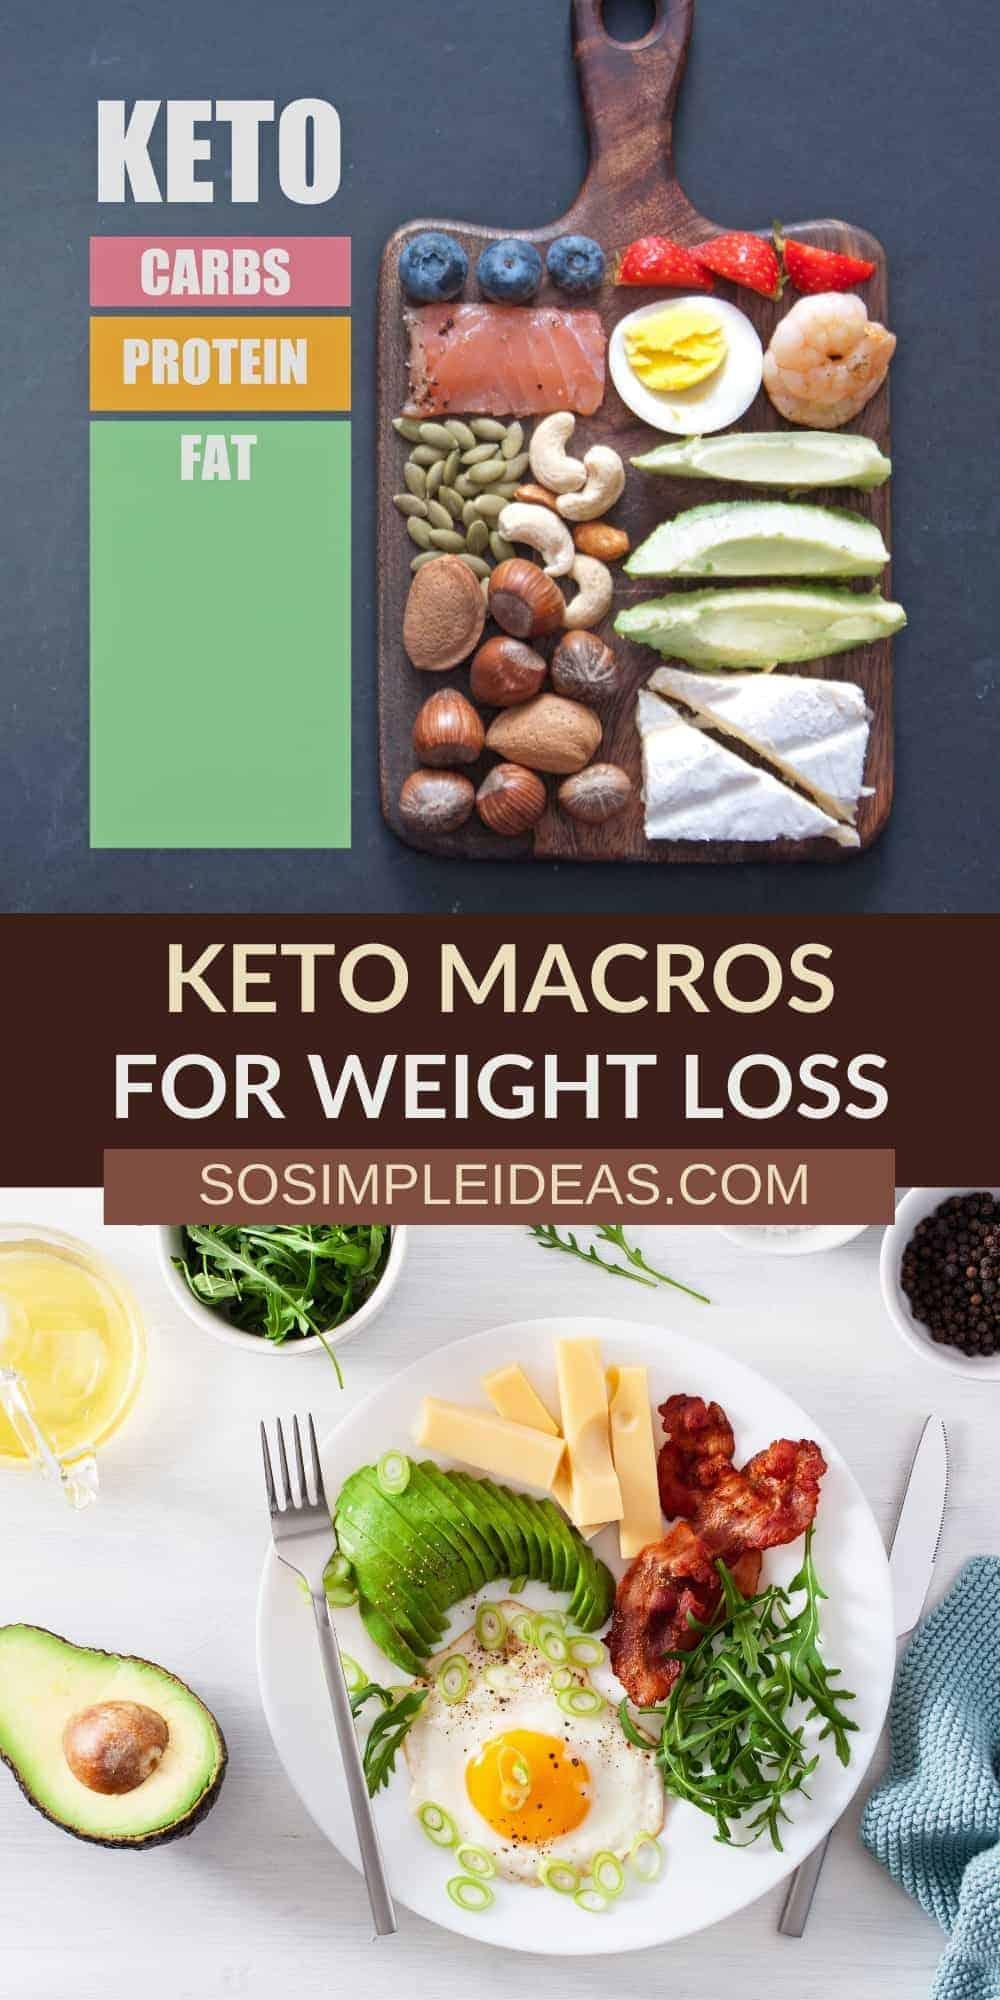 keto macros for weight loss pinterest image